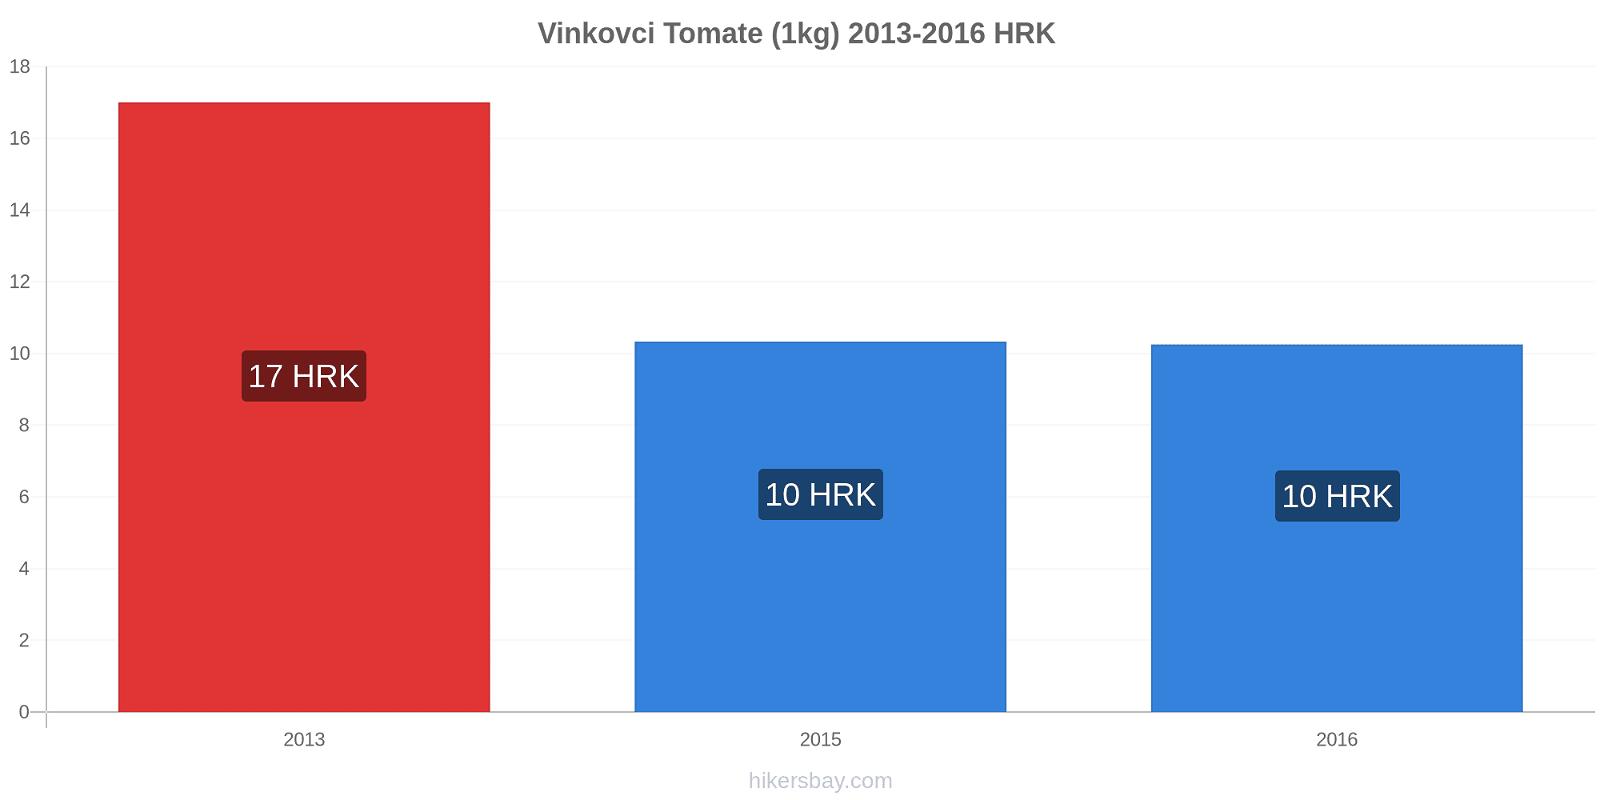 Vinkovci changements de prix Tomate (1kg) hikersbay.com